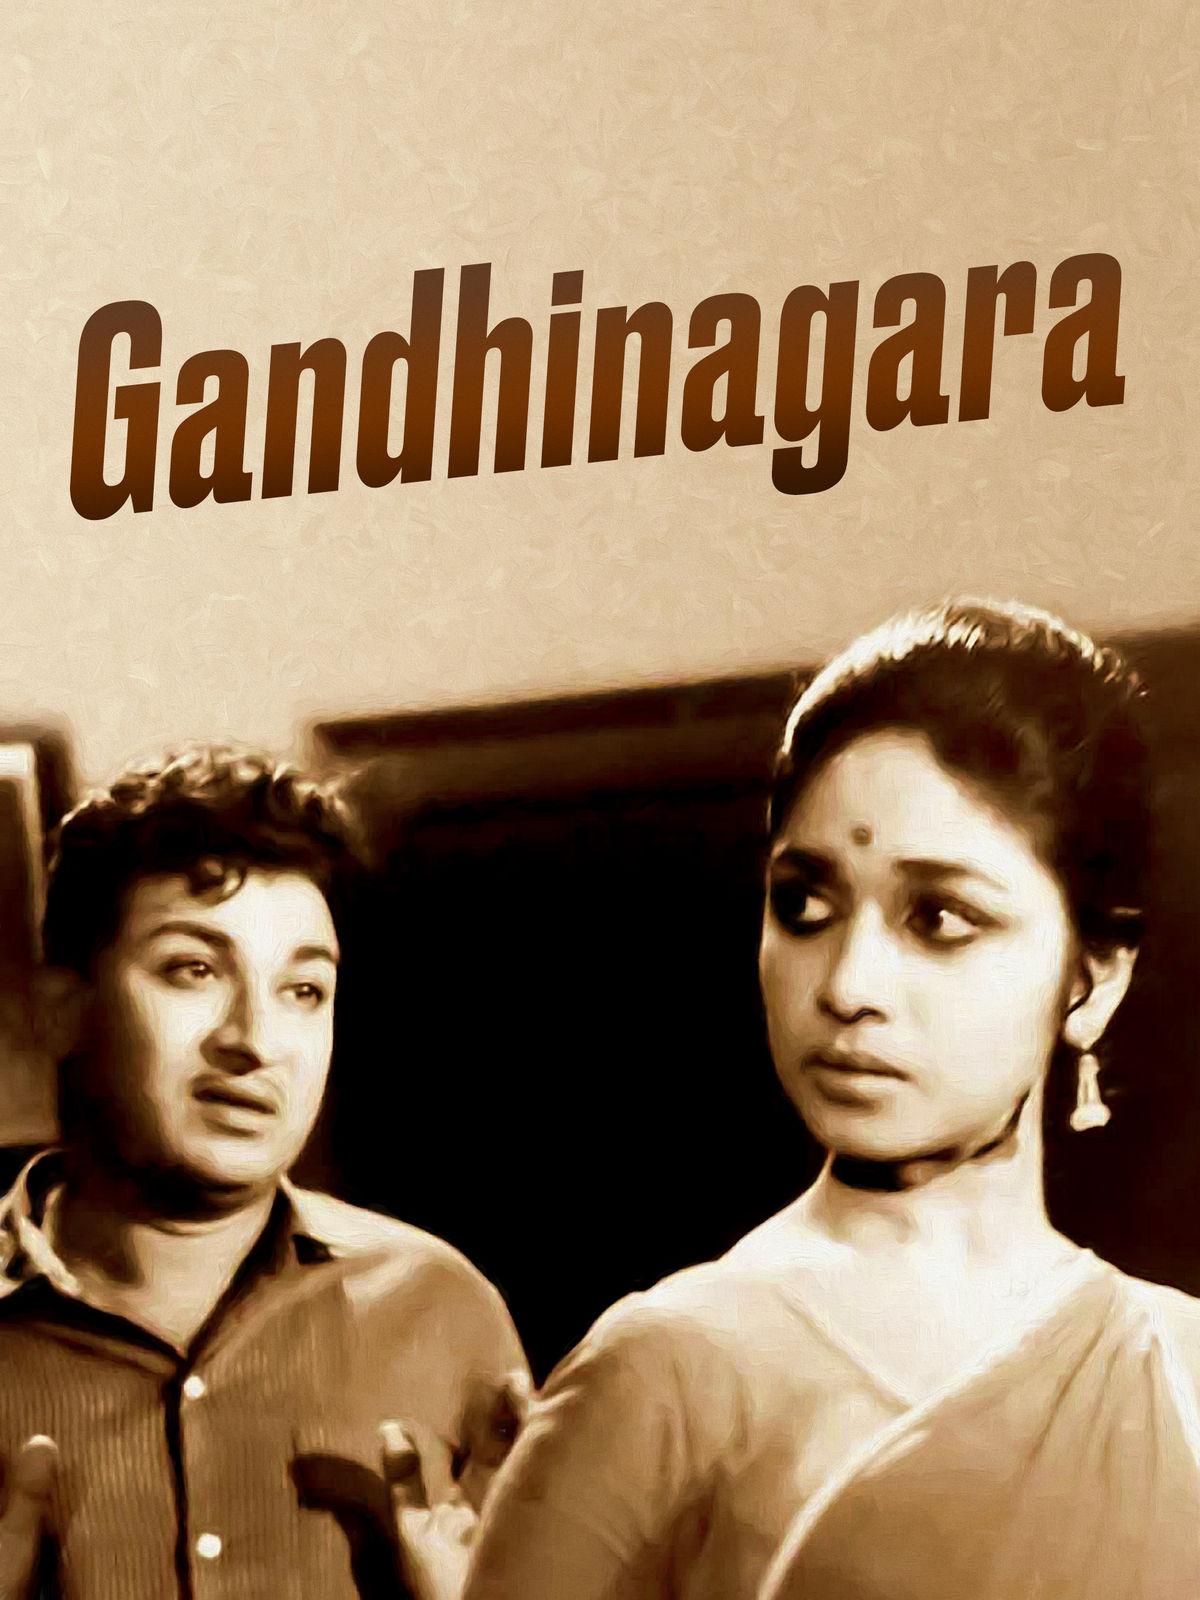 Gandhinagara